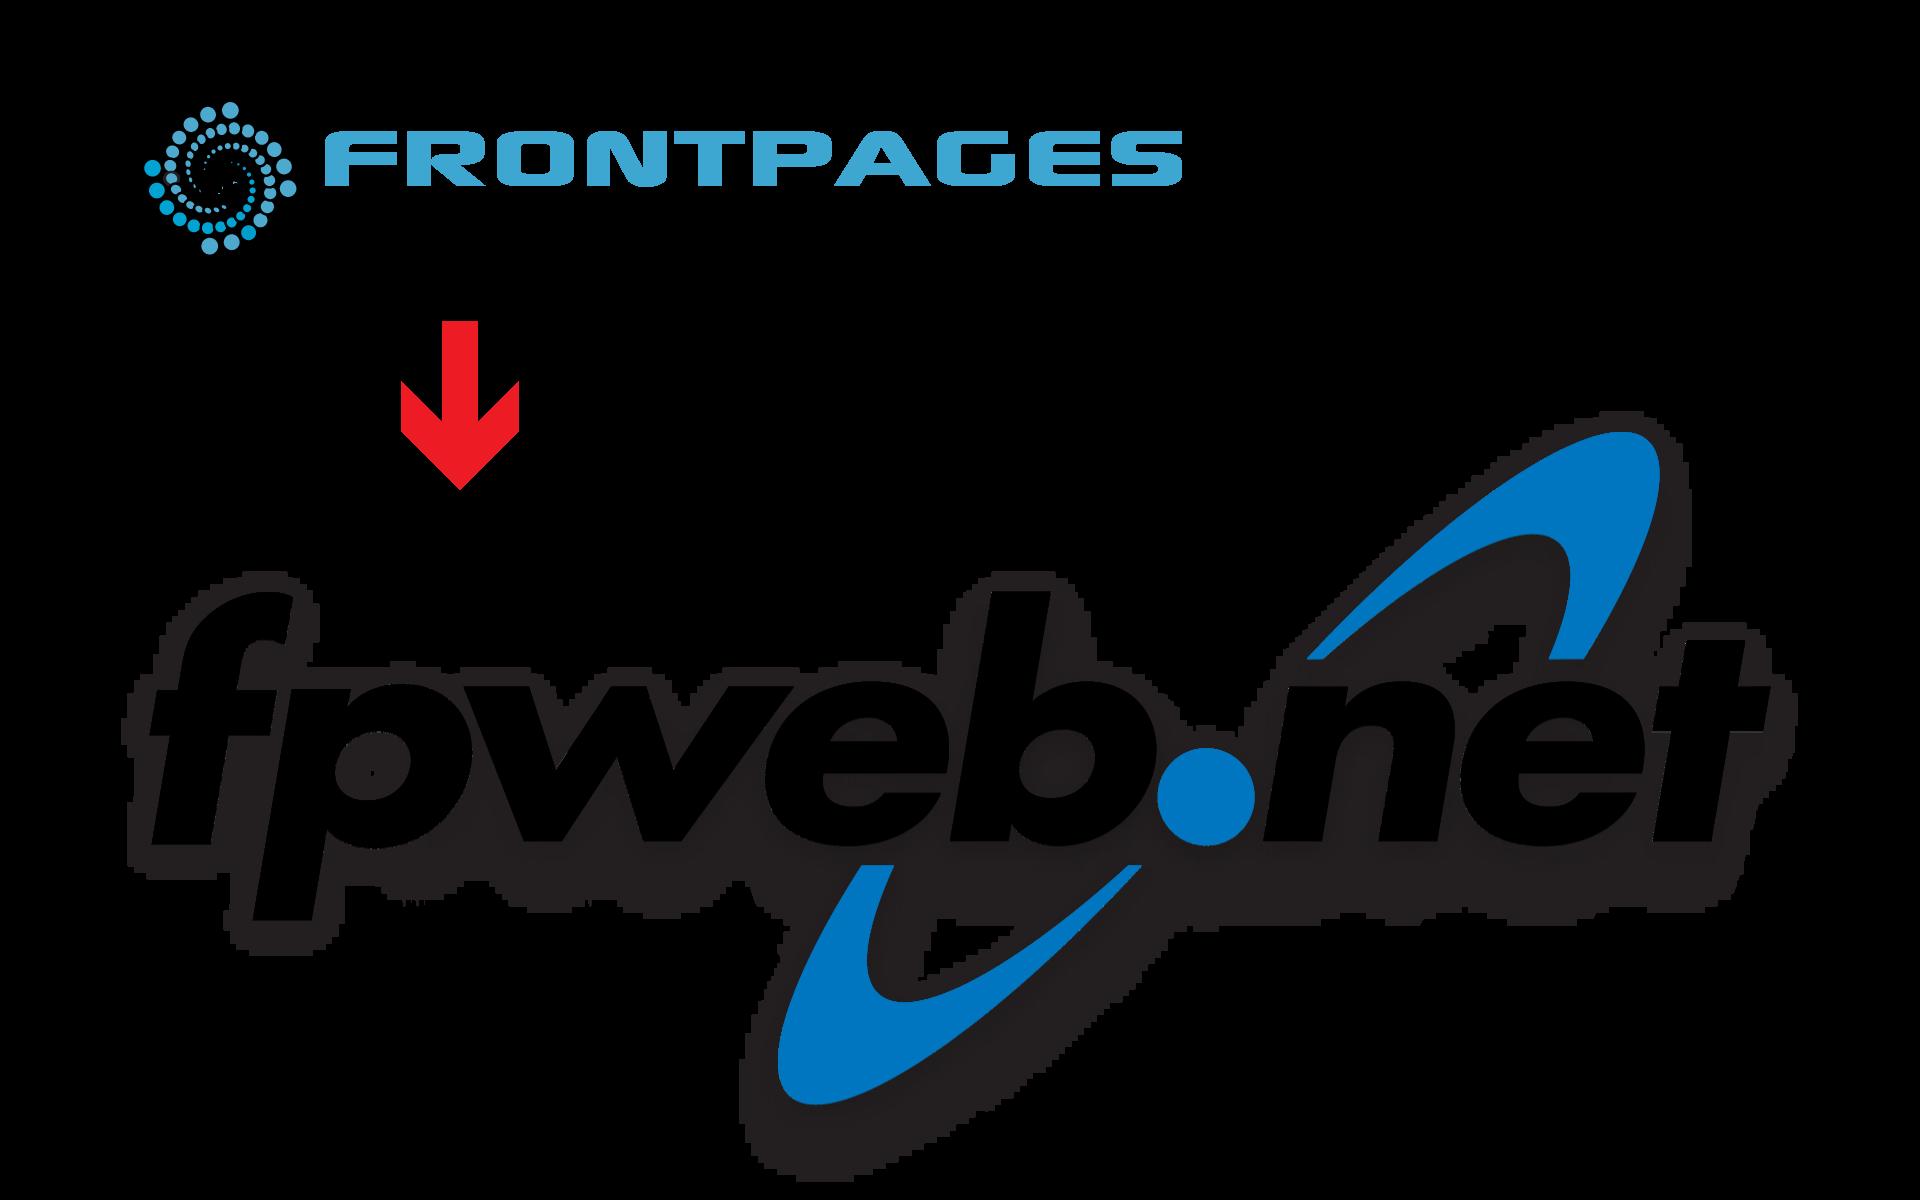 Fpweb.net Brand Transformation